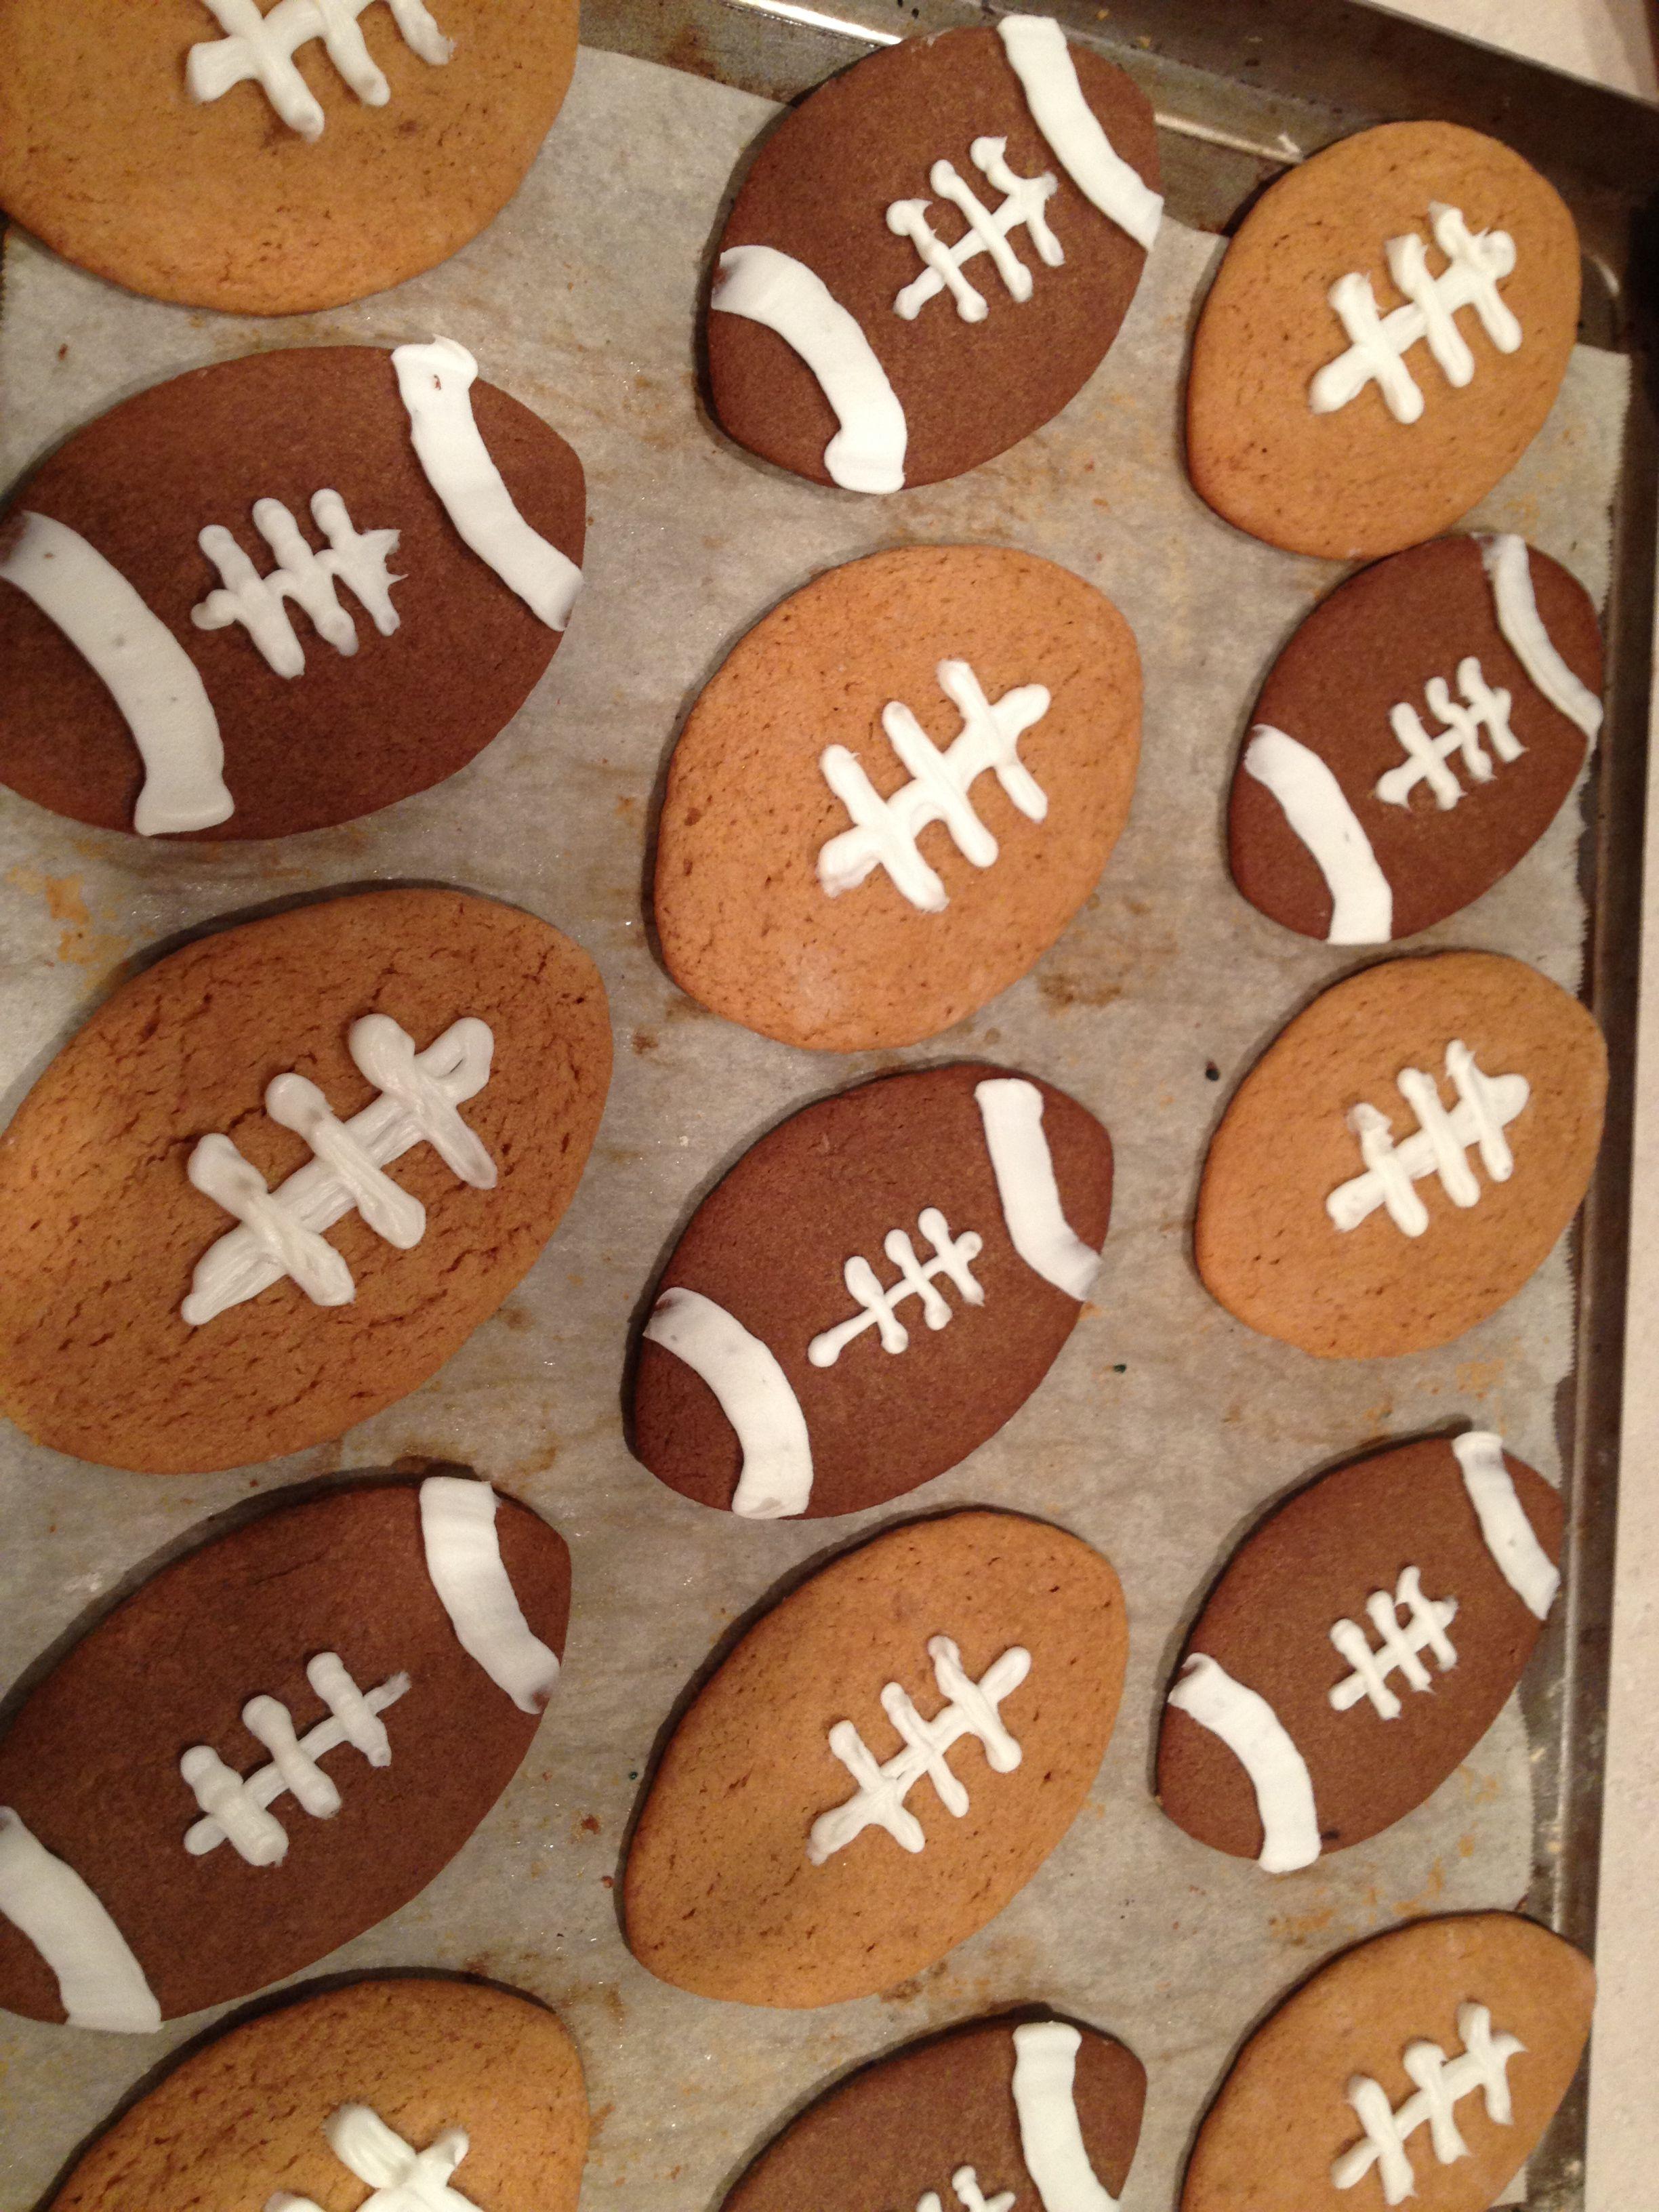 Baking Super Bowl cookies